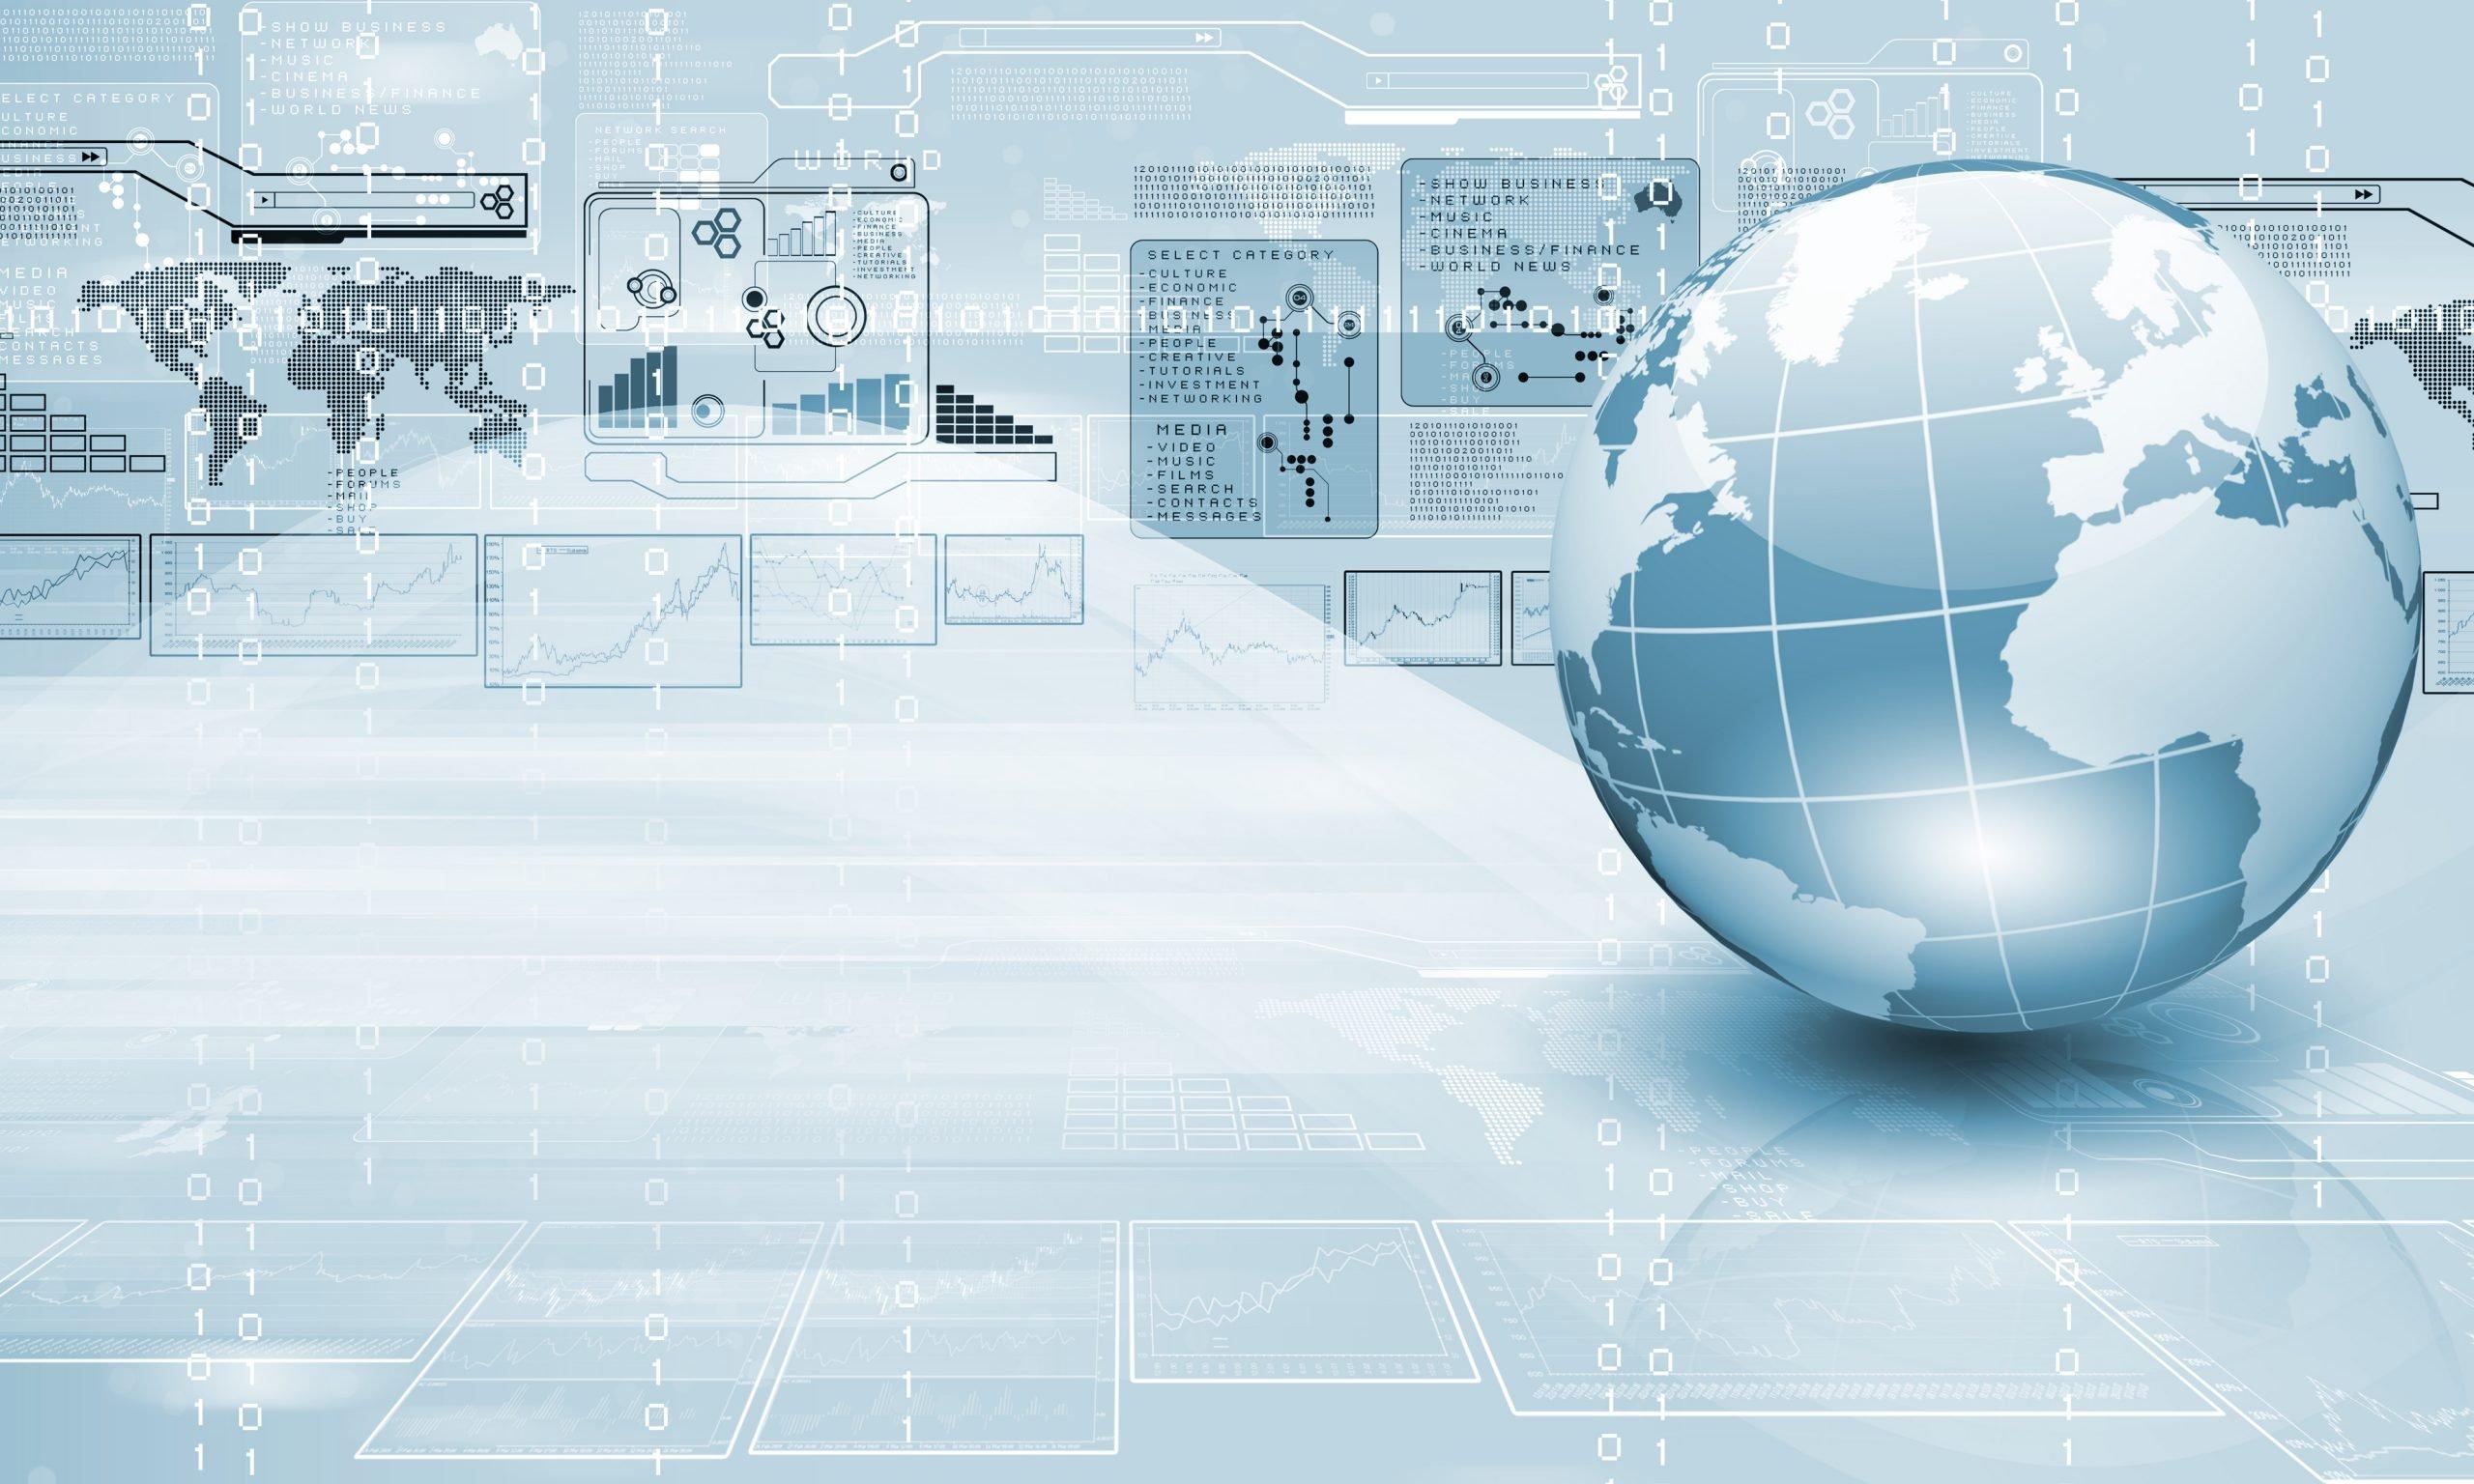 Global marketing agency serving Korean and Asian market expansion